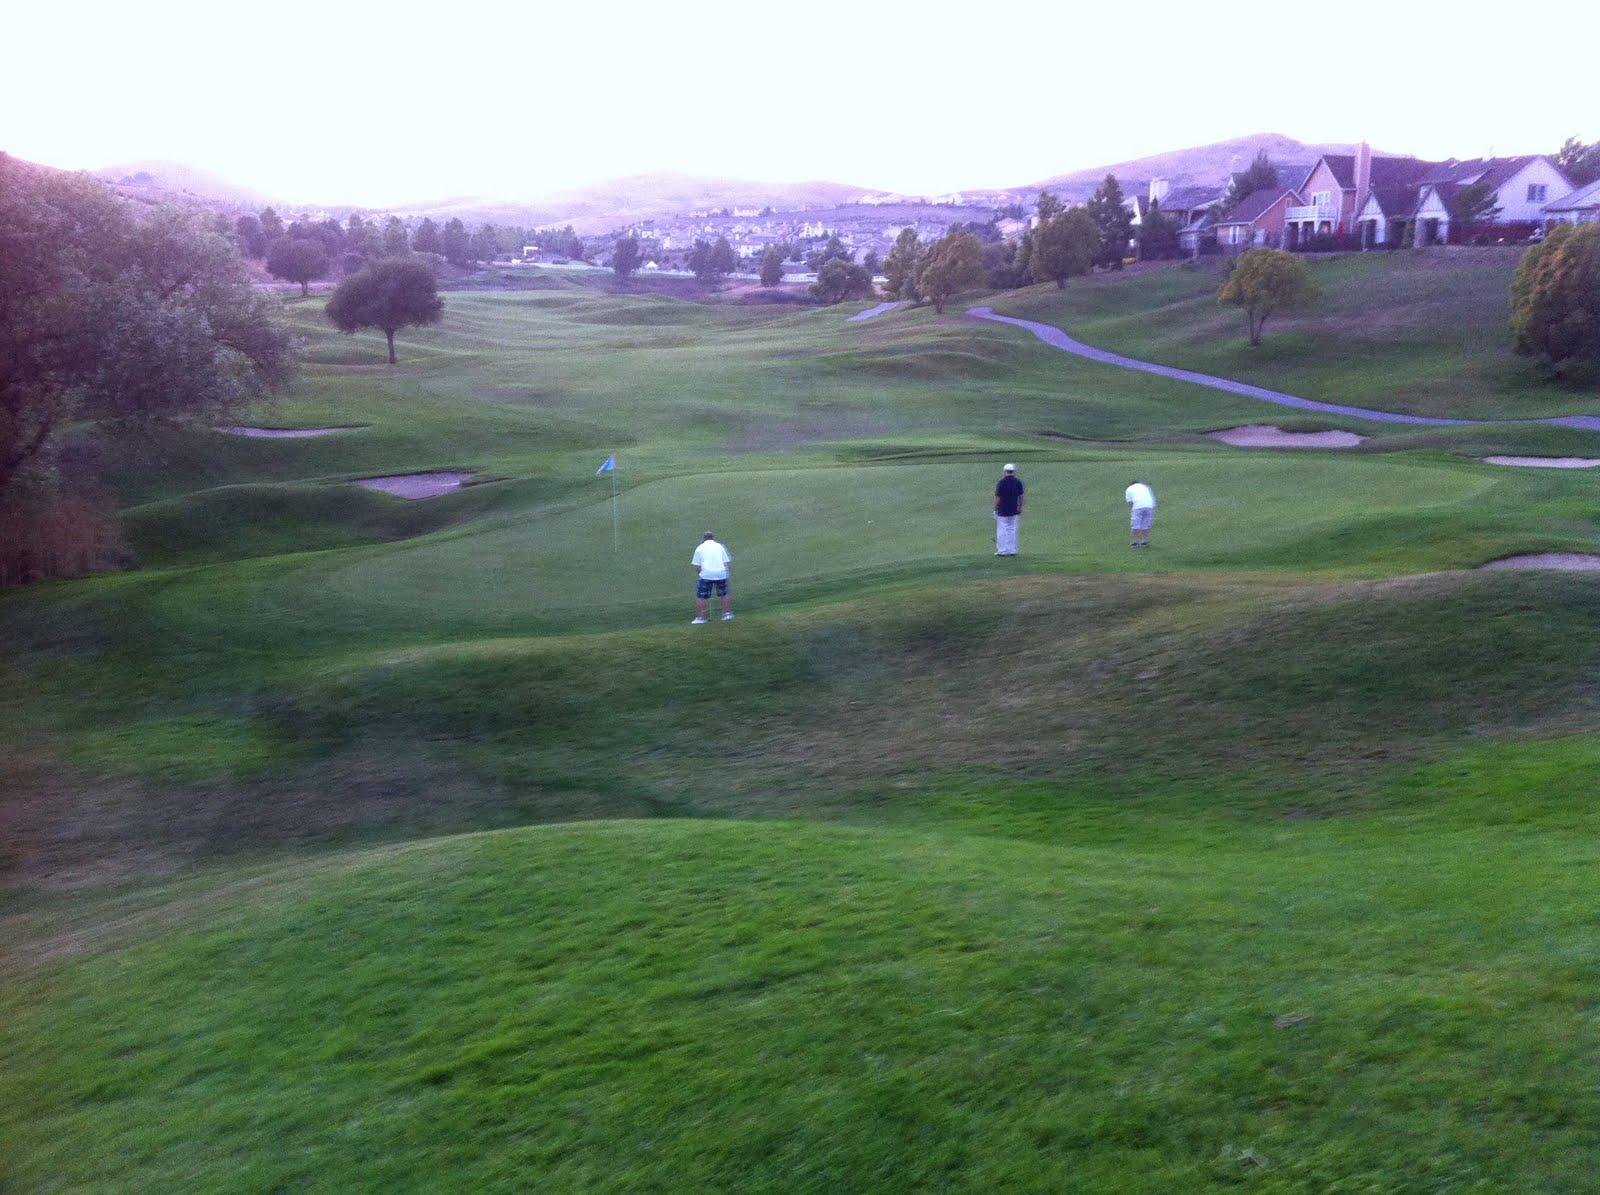 http://3.bp.blogspot.com/_av_FfdJzfTo/TFc9w0C2doI/AAAAAAAAAeI/fPiPeiH1dNQ/s1600/Matt_Golf2.jpg